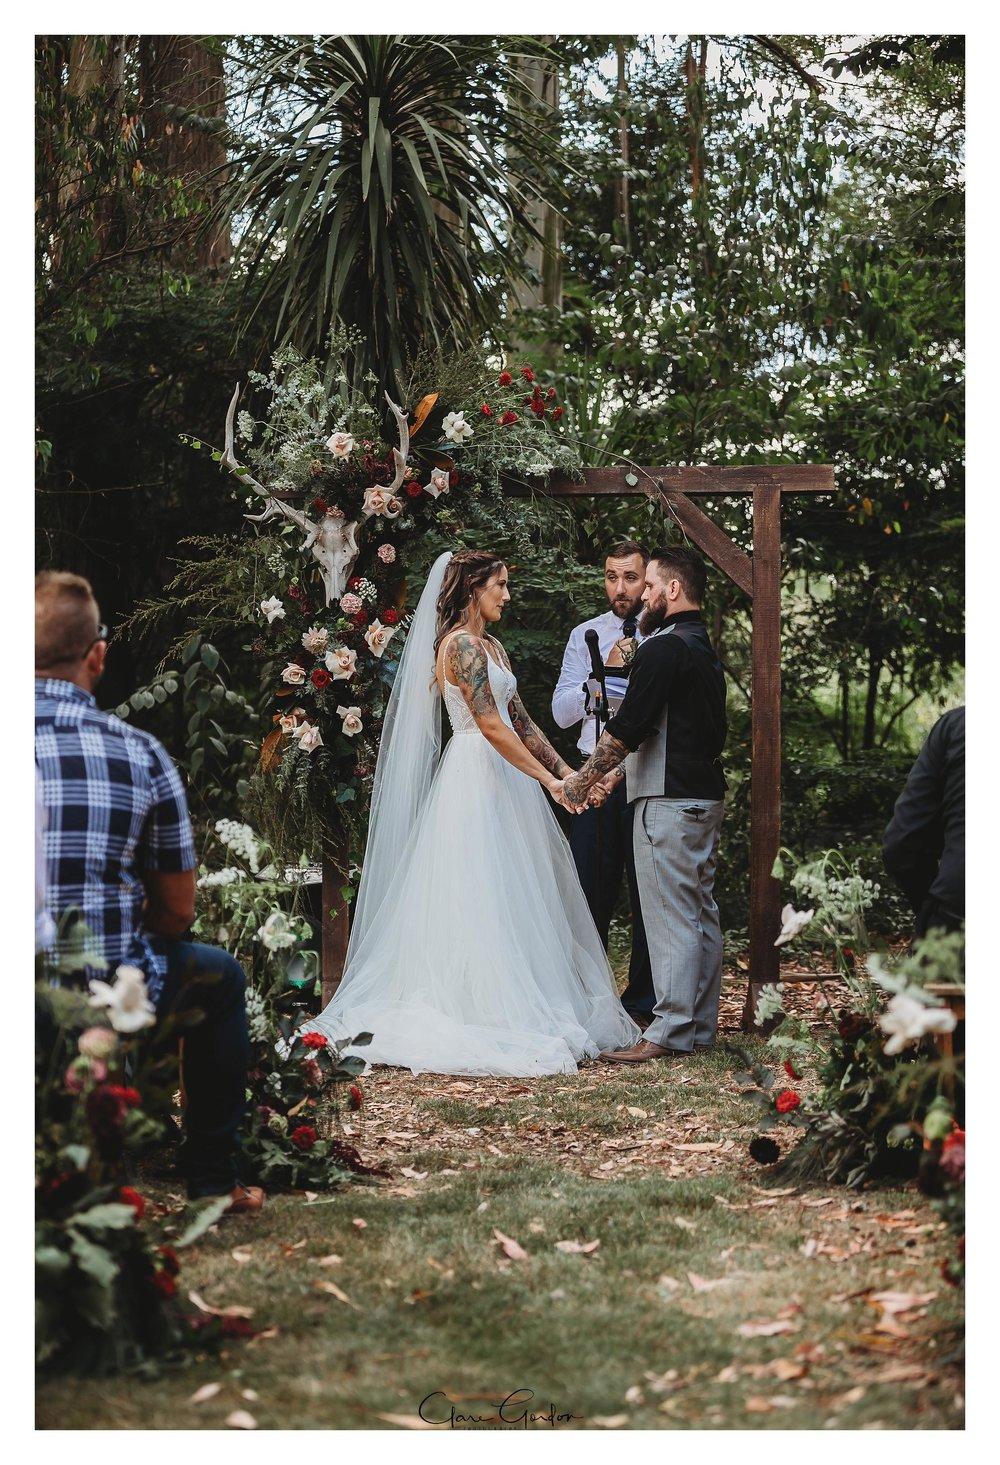 Waikato-wedding-photographer-Forest-weddnig-Hamilton-wedding-Newzealand (75).jpg